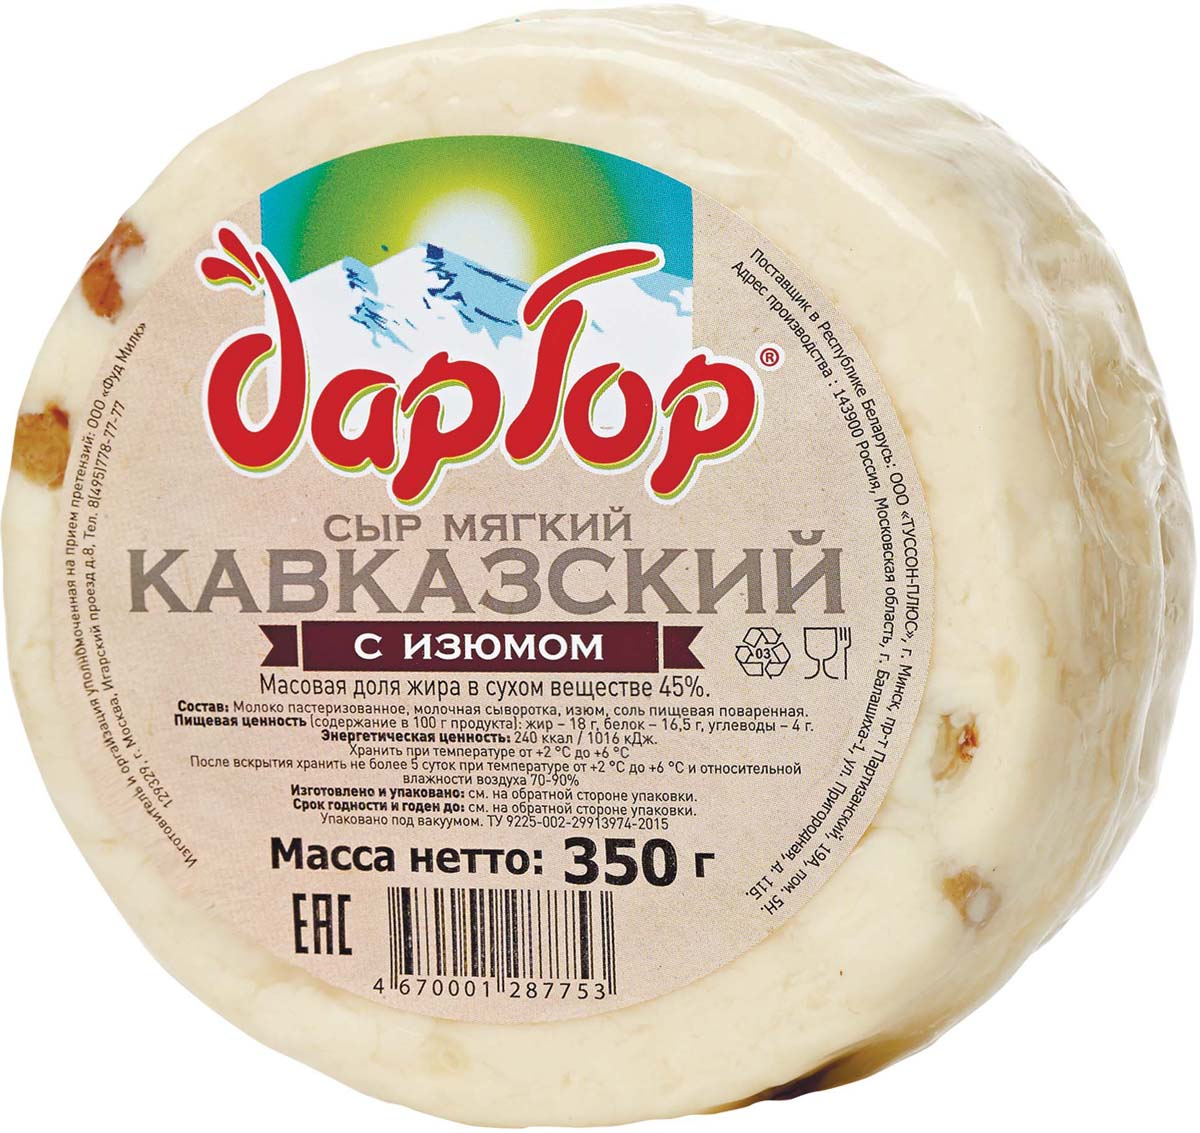 Дар Гор Сыр мягкий Кавказский с Изюмом, 350 г